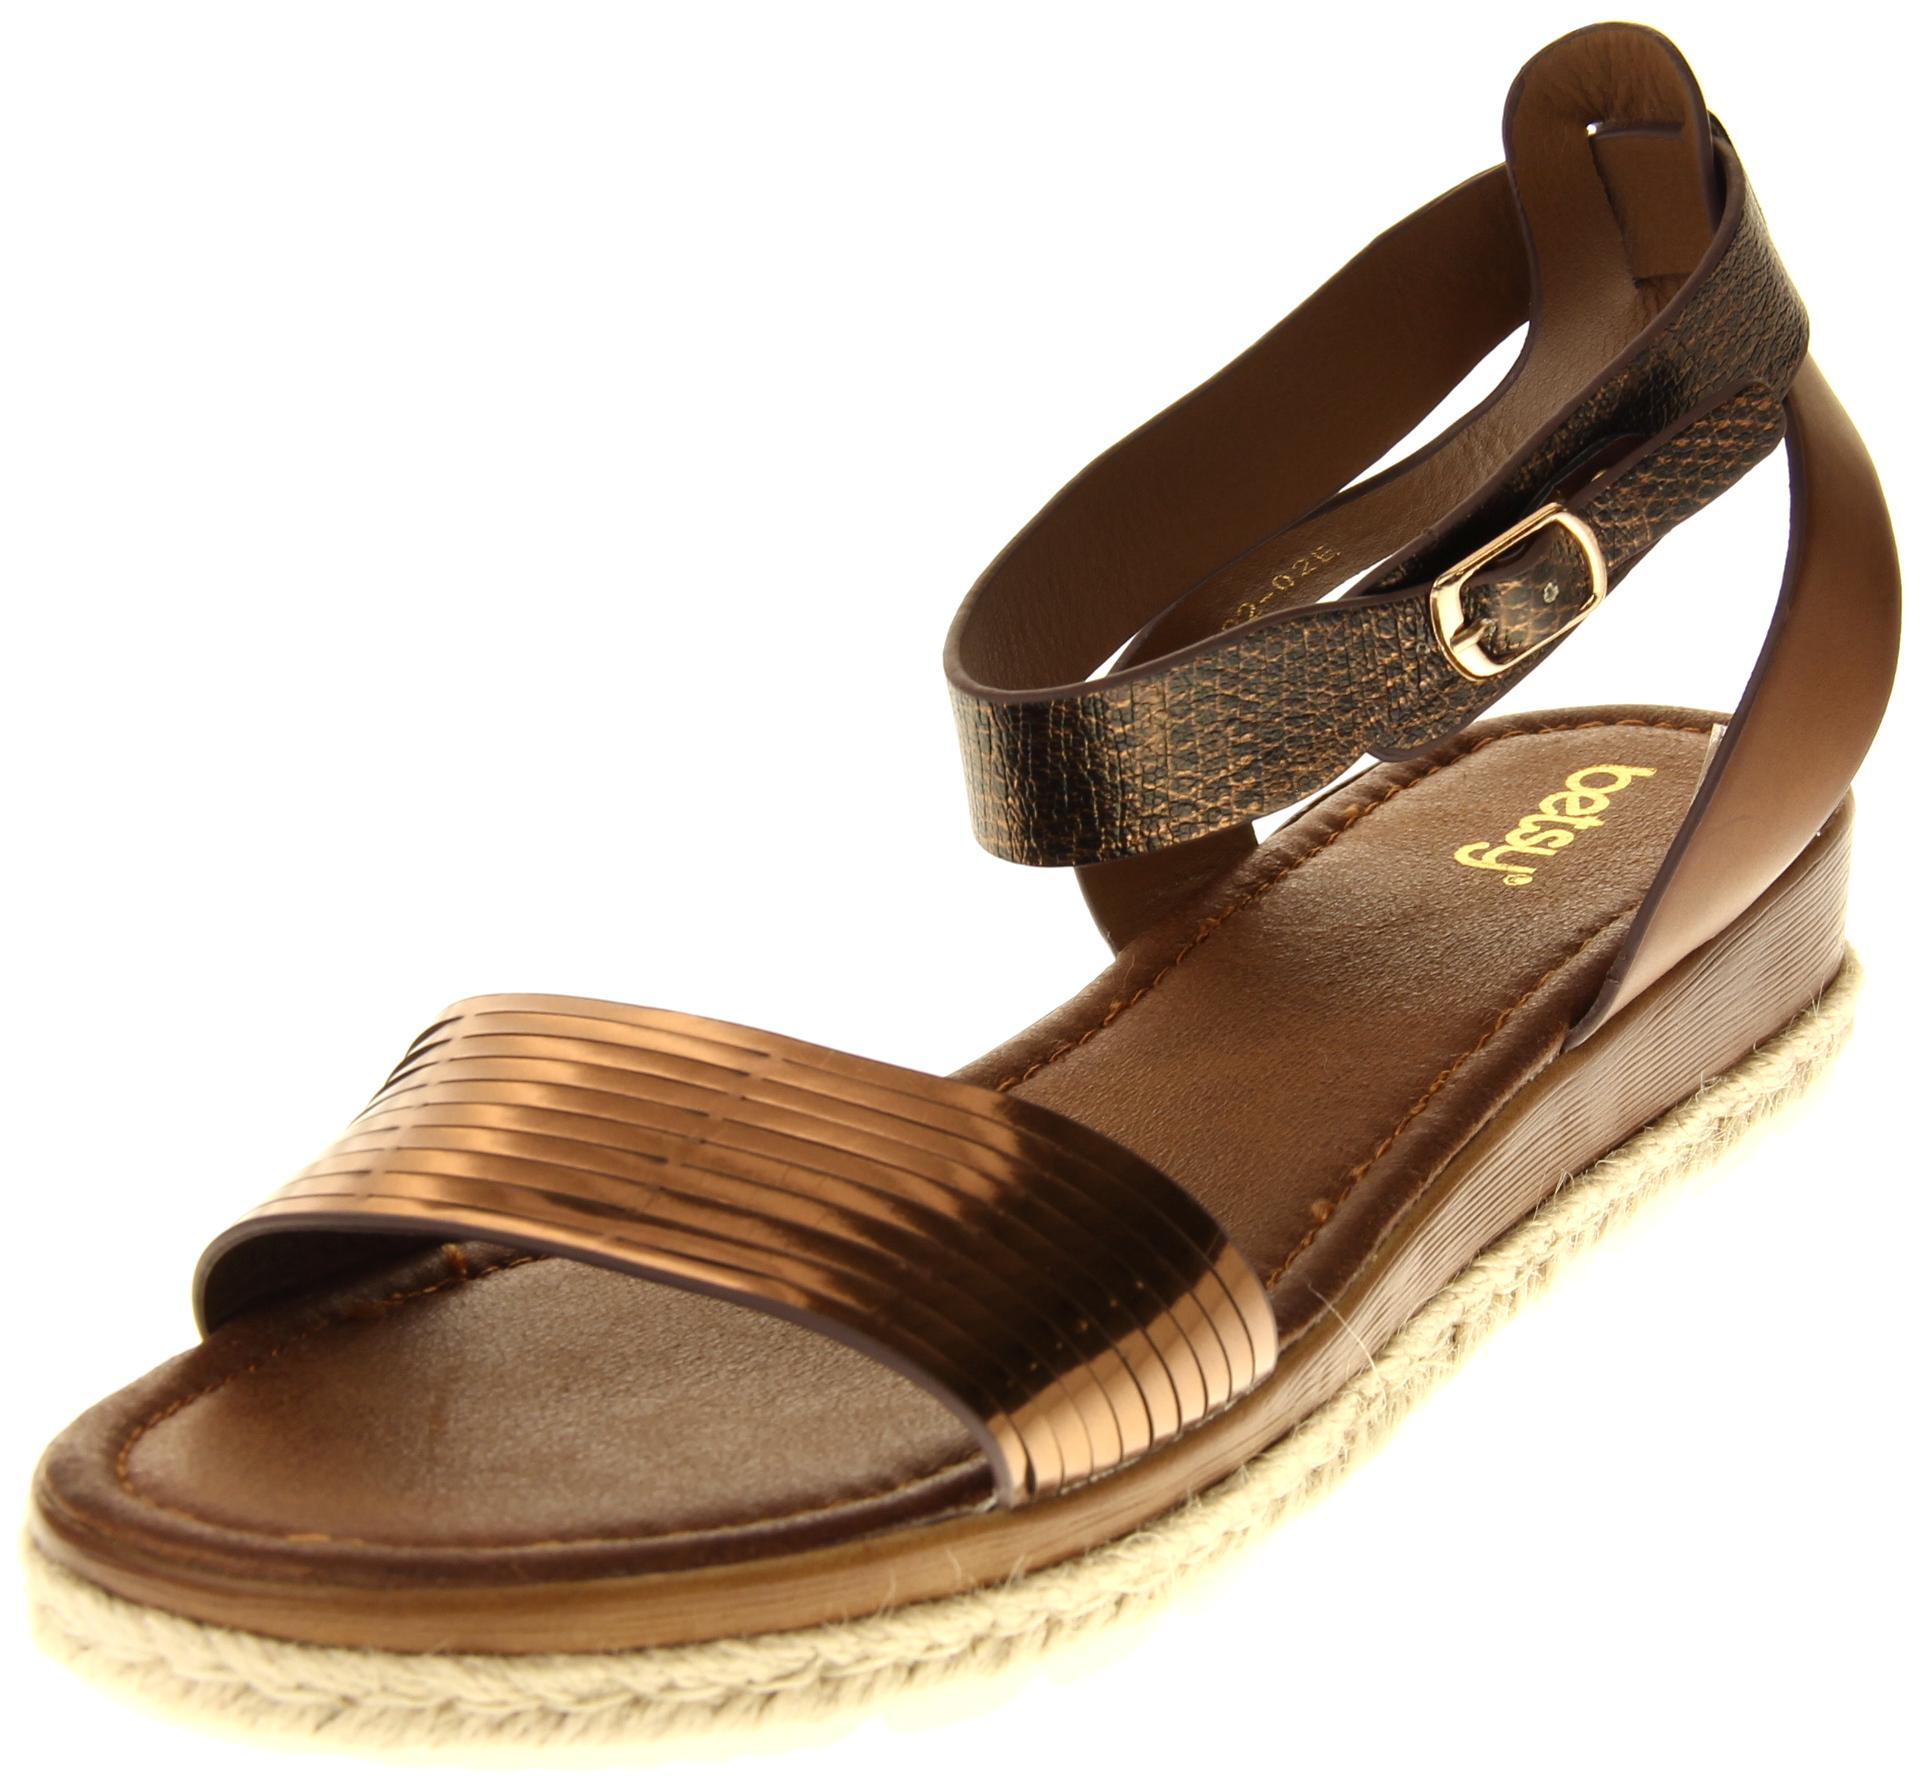 bd54924f47b5 Womens Ladies Keddo Bronze Faux Leather Gladiator Sandals